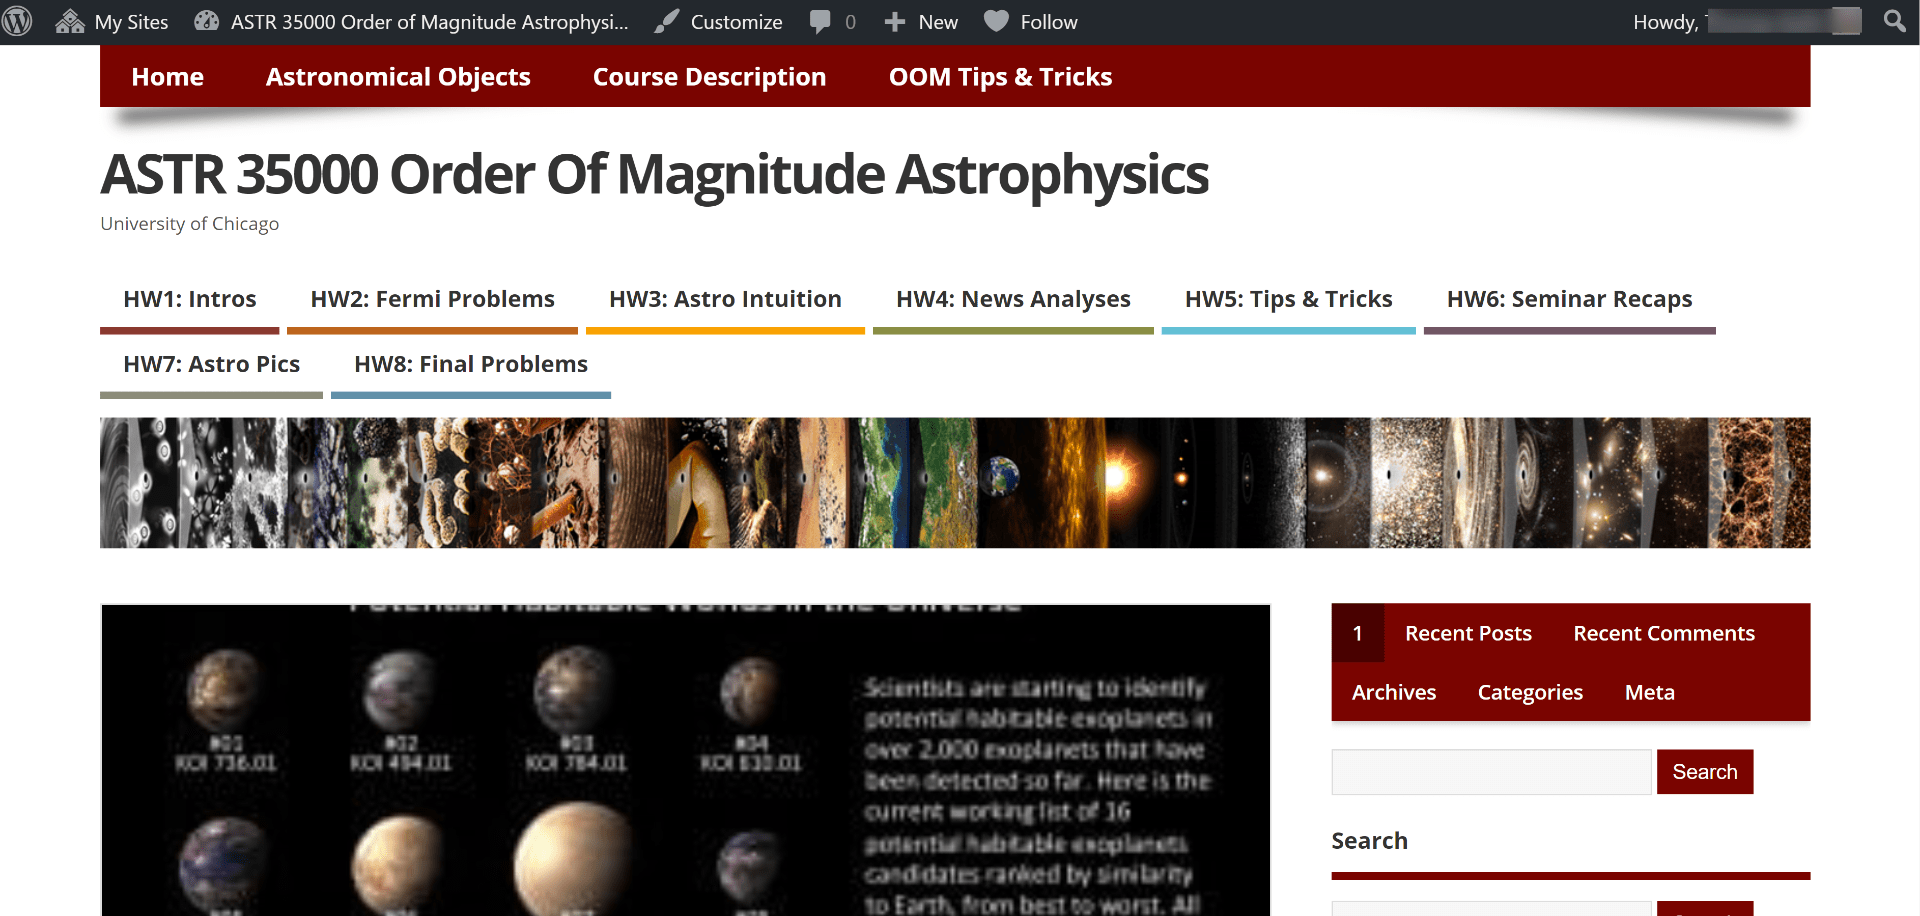 Home screen of Order of Magnitude Astrophysics course blog